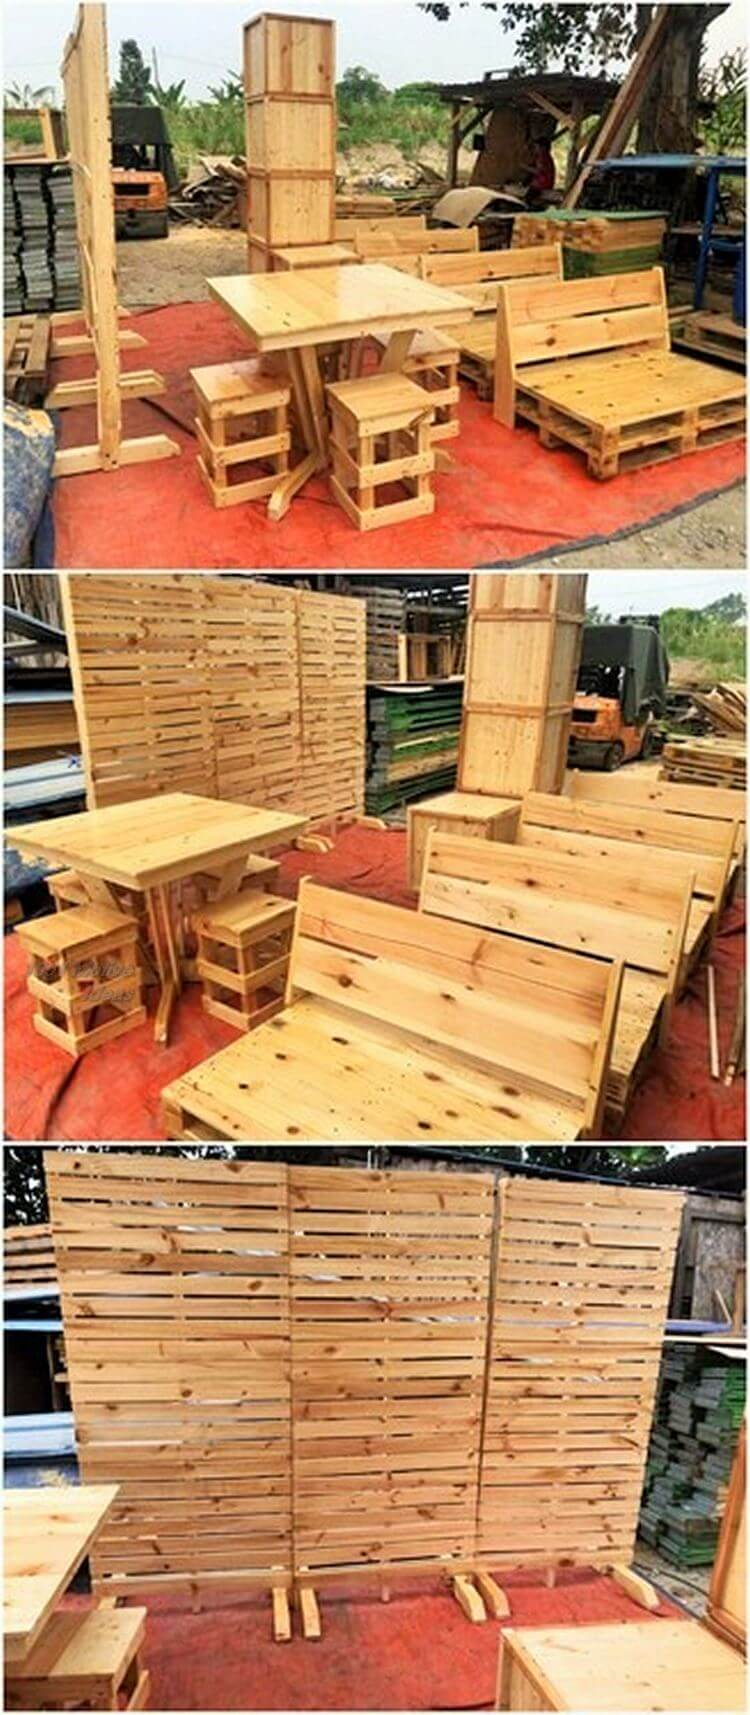 Diy- pallet into an outdoor bench- 09